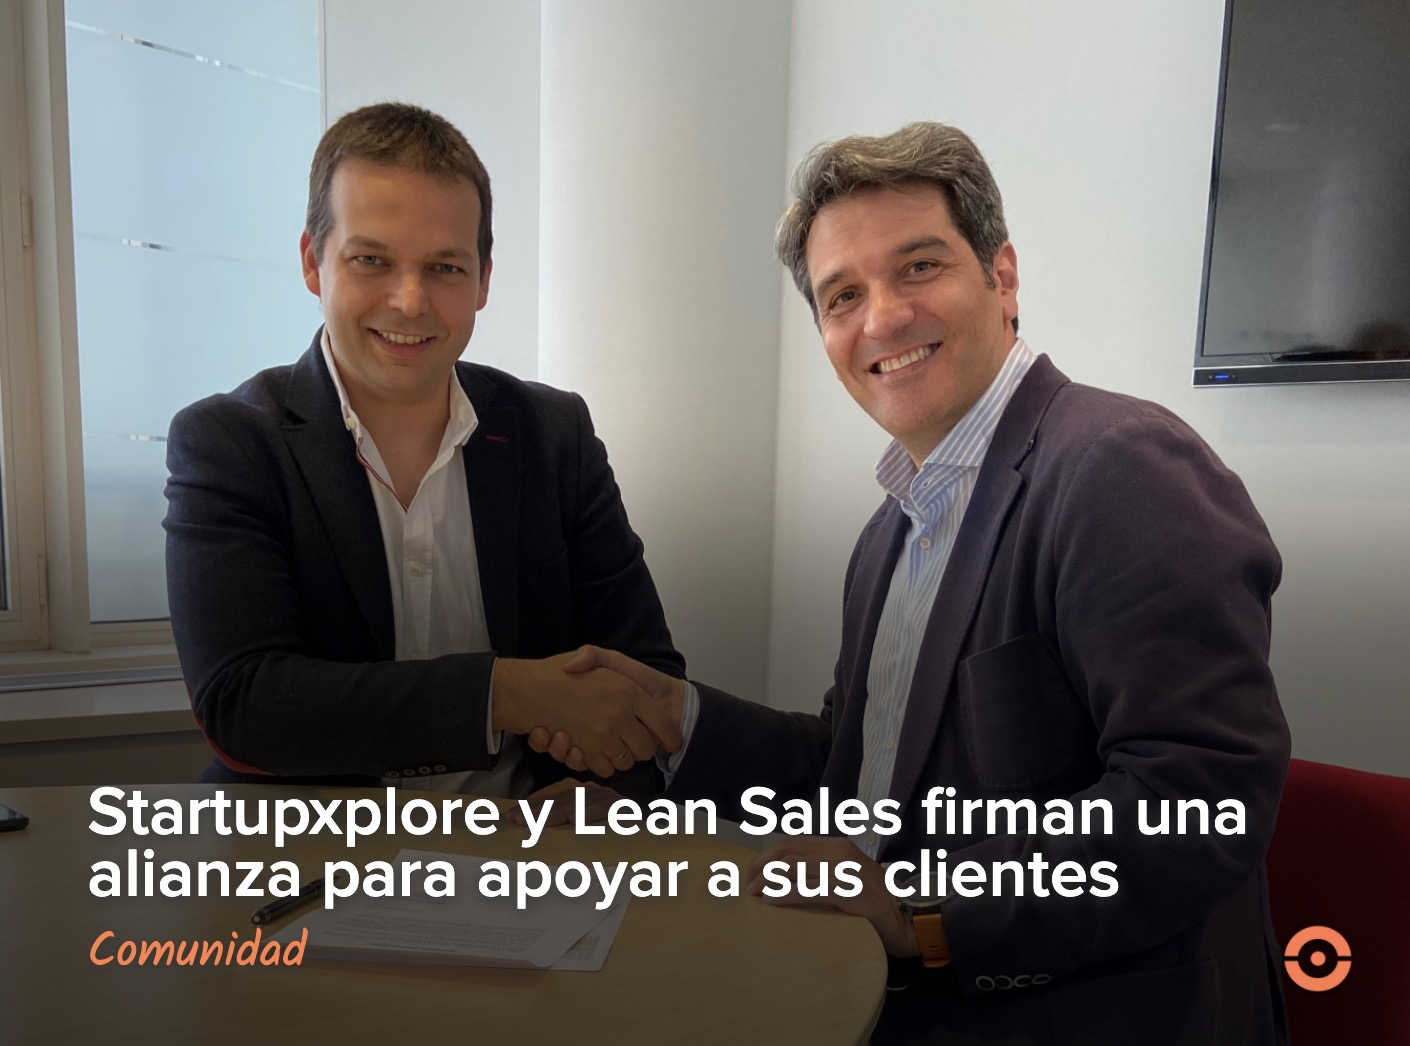 Startupxplore cierra acuerdo con Lean Sales